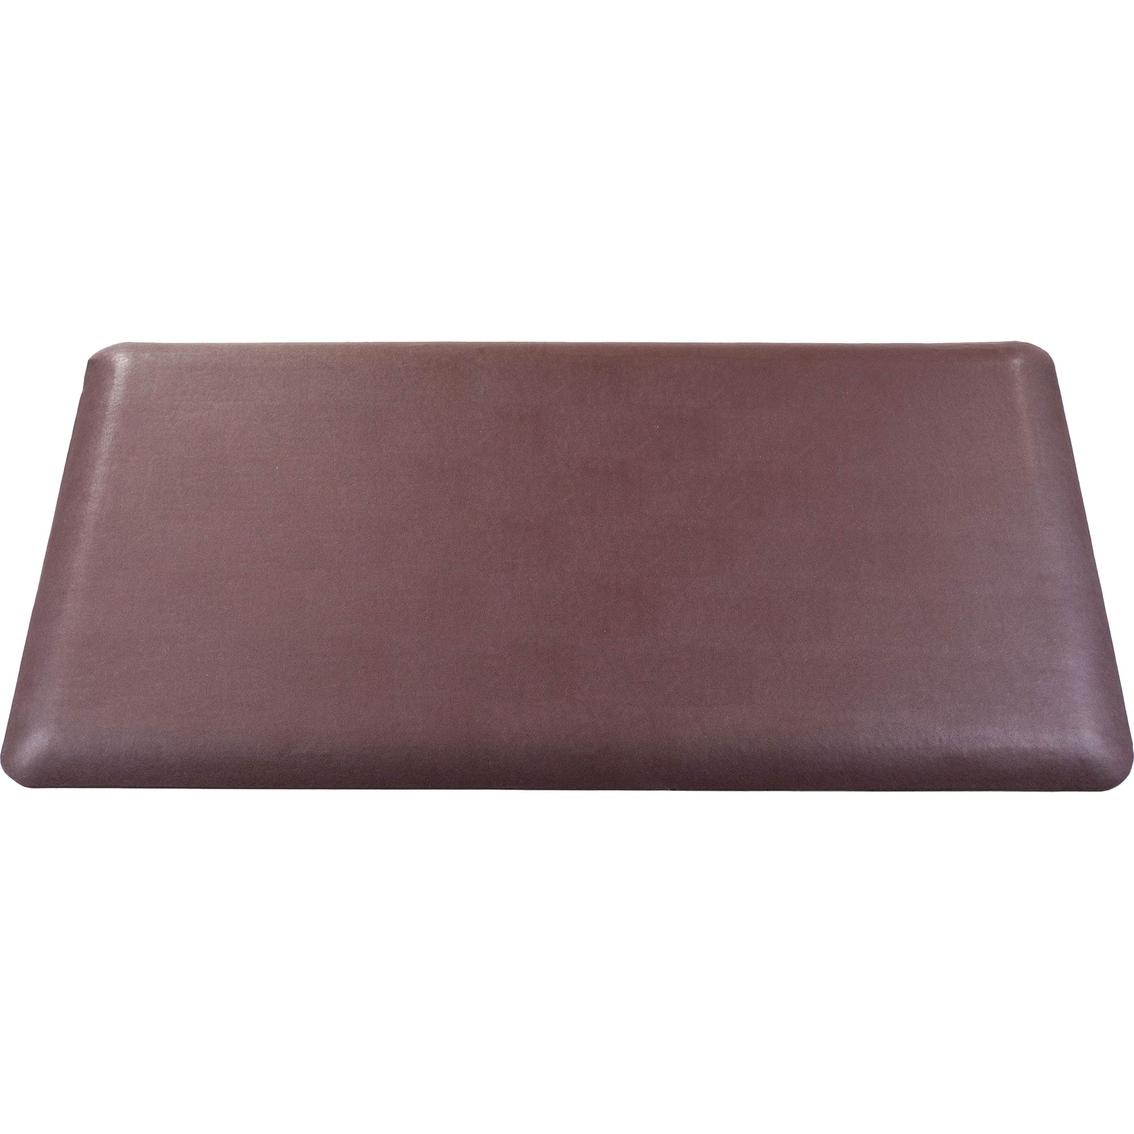 kitchen comfort mat tile lavish home rugs and appliances